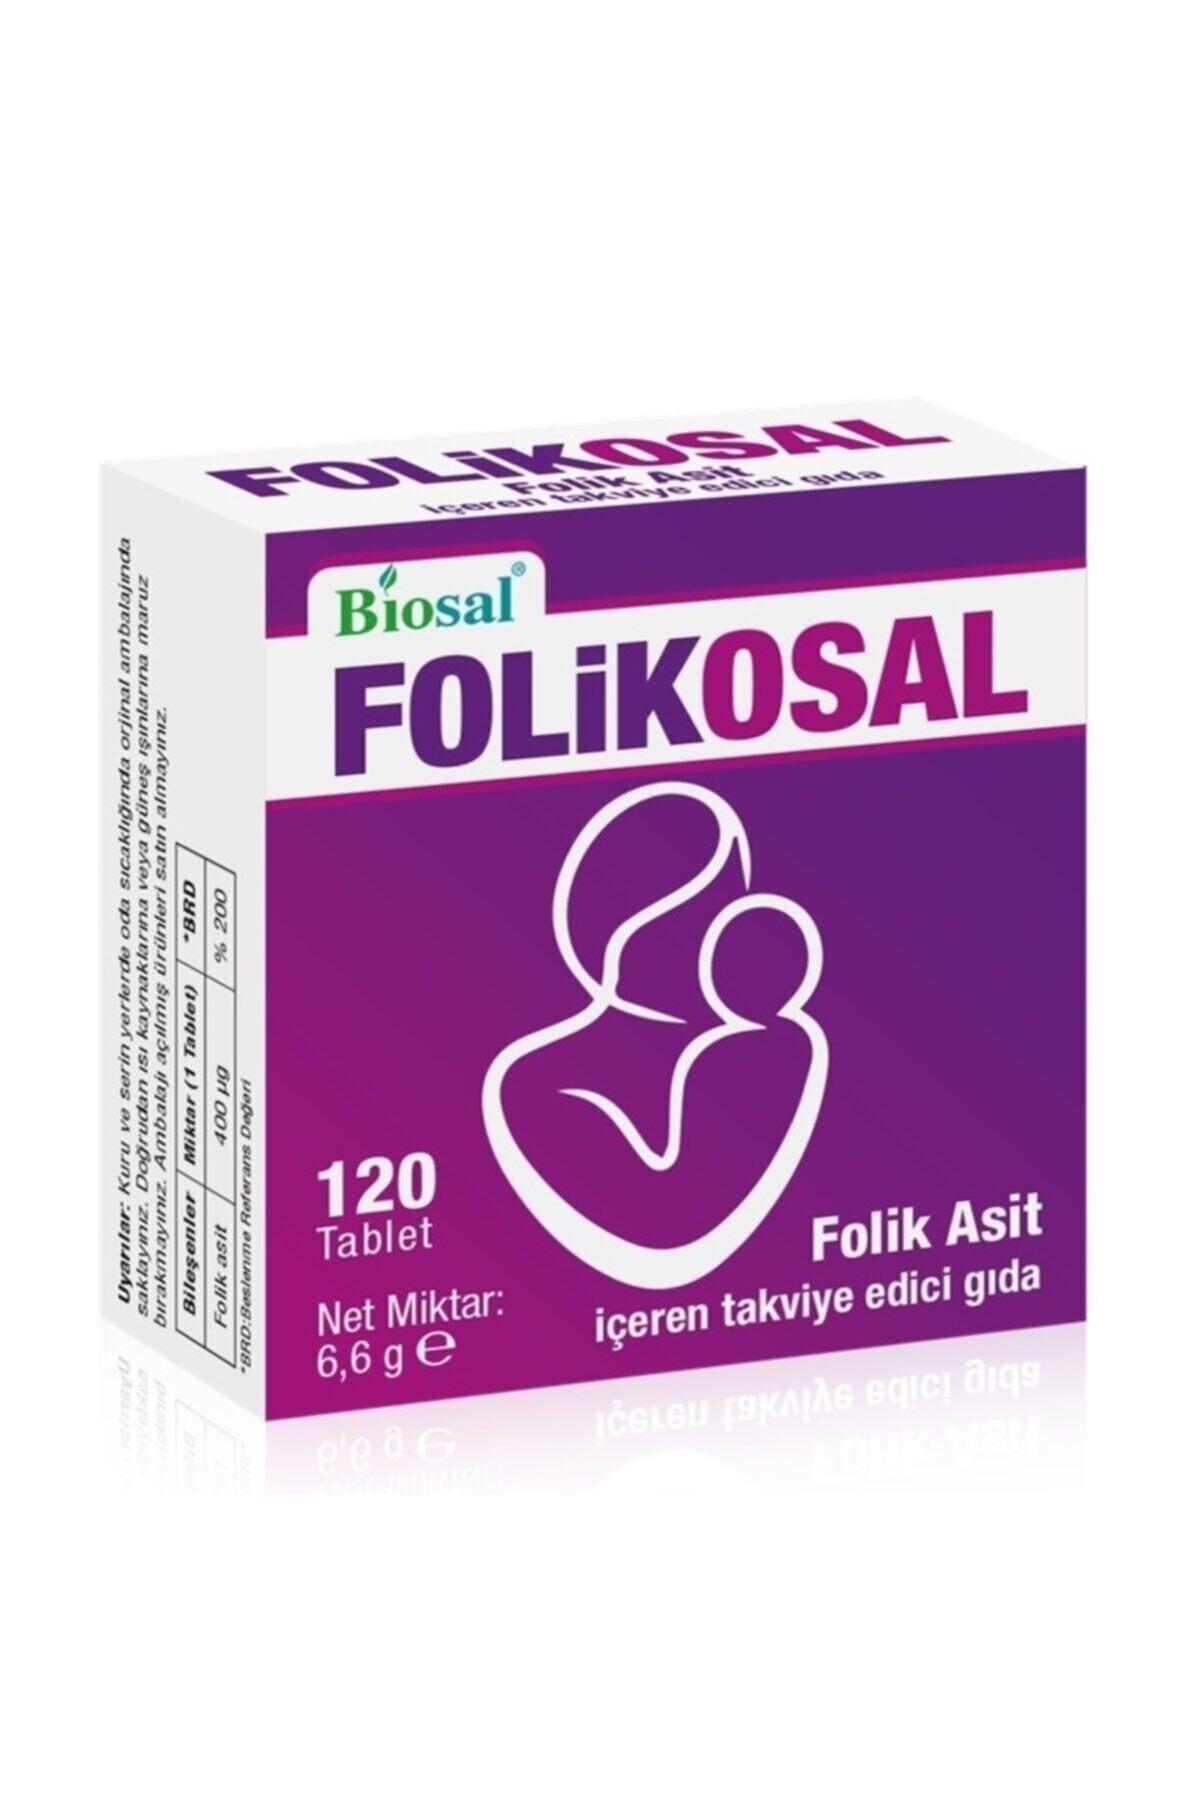 Biosal Folik Asit 400 Mcg 120 Tablet 1